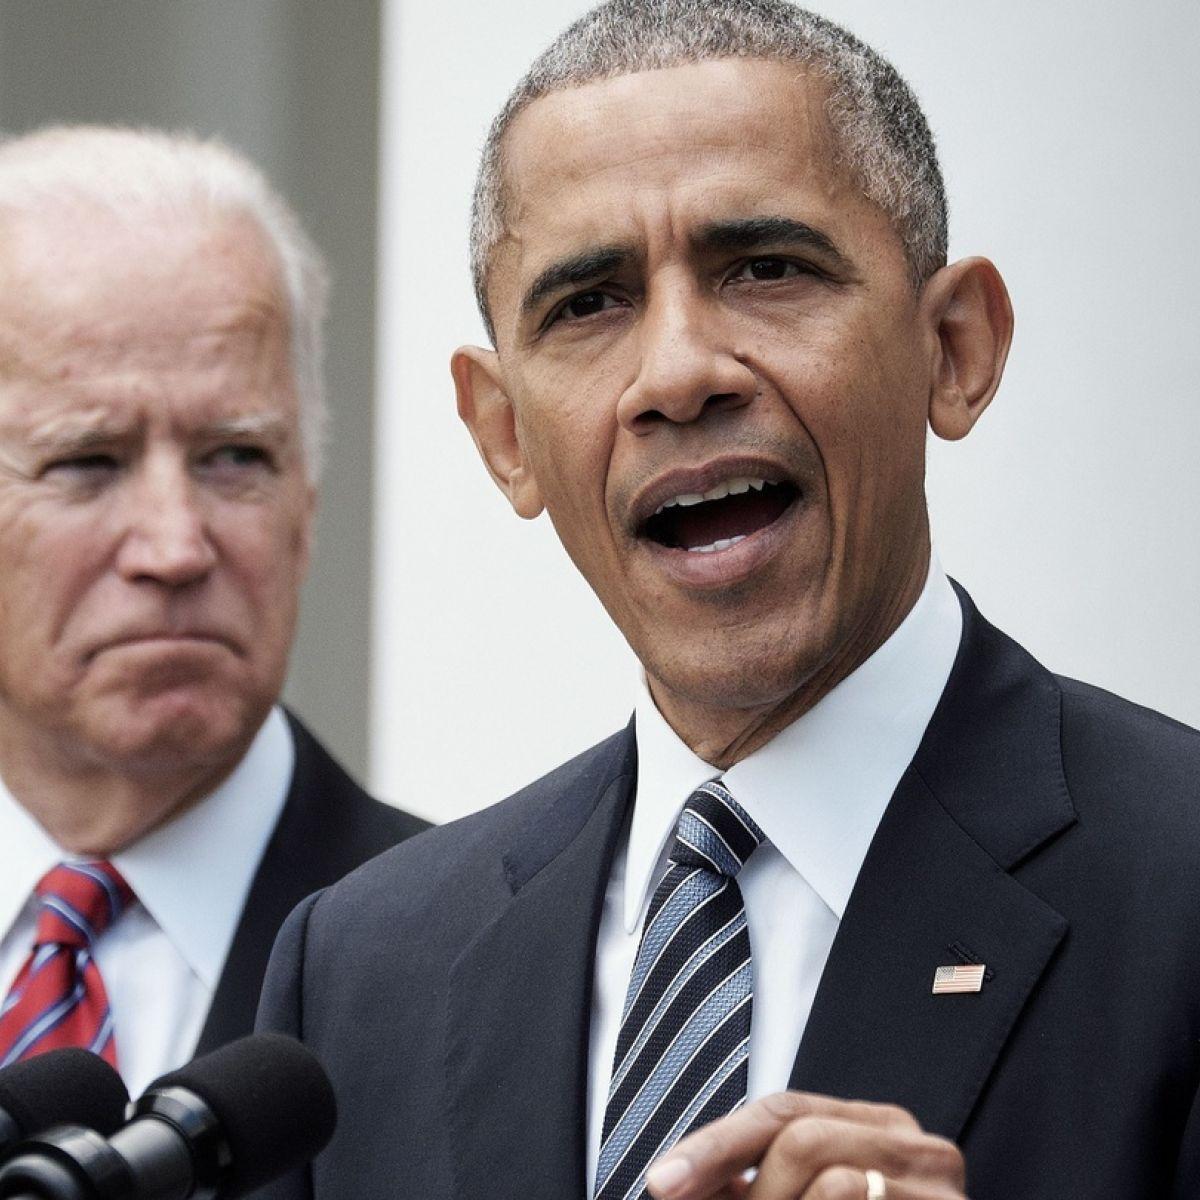 Joe Biden Memes How Us Vice President Became Internet Star